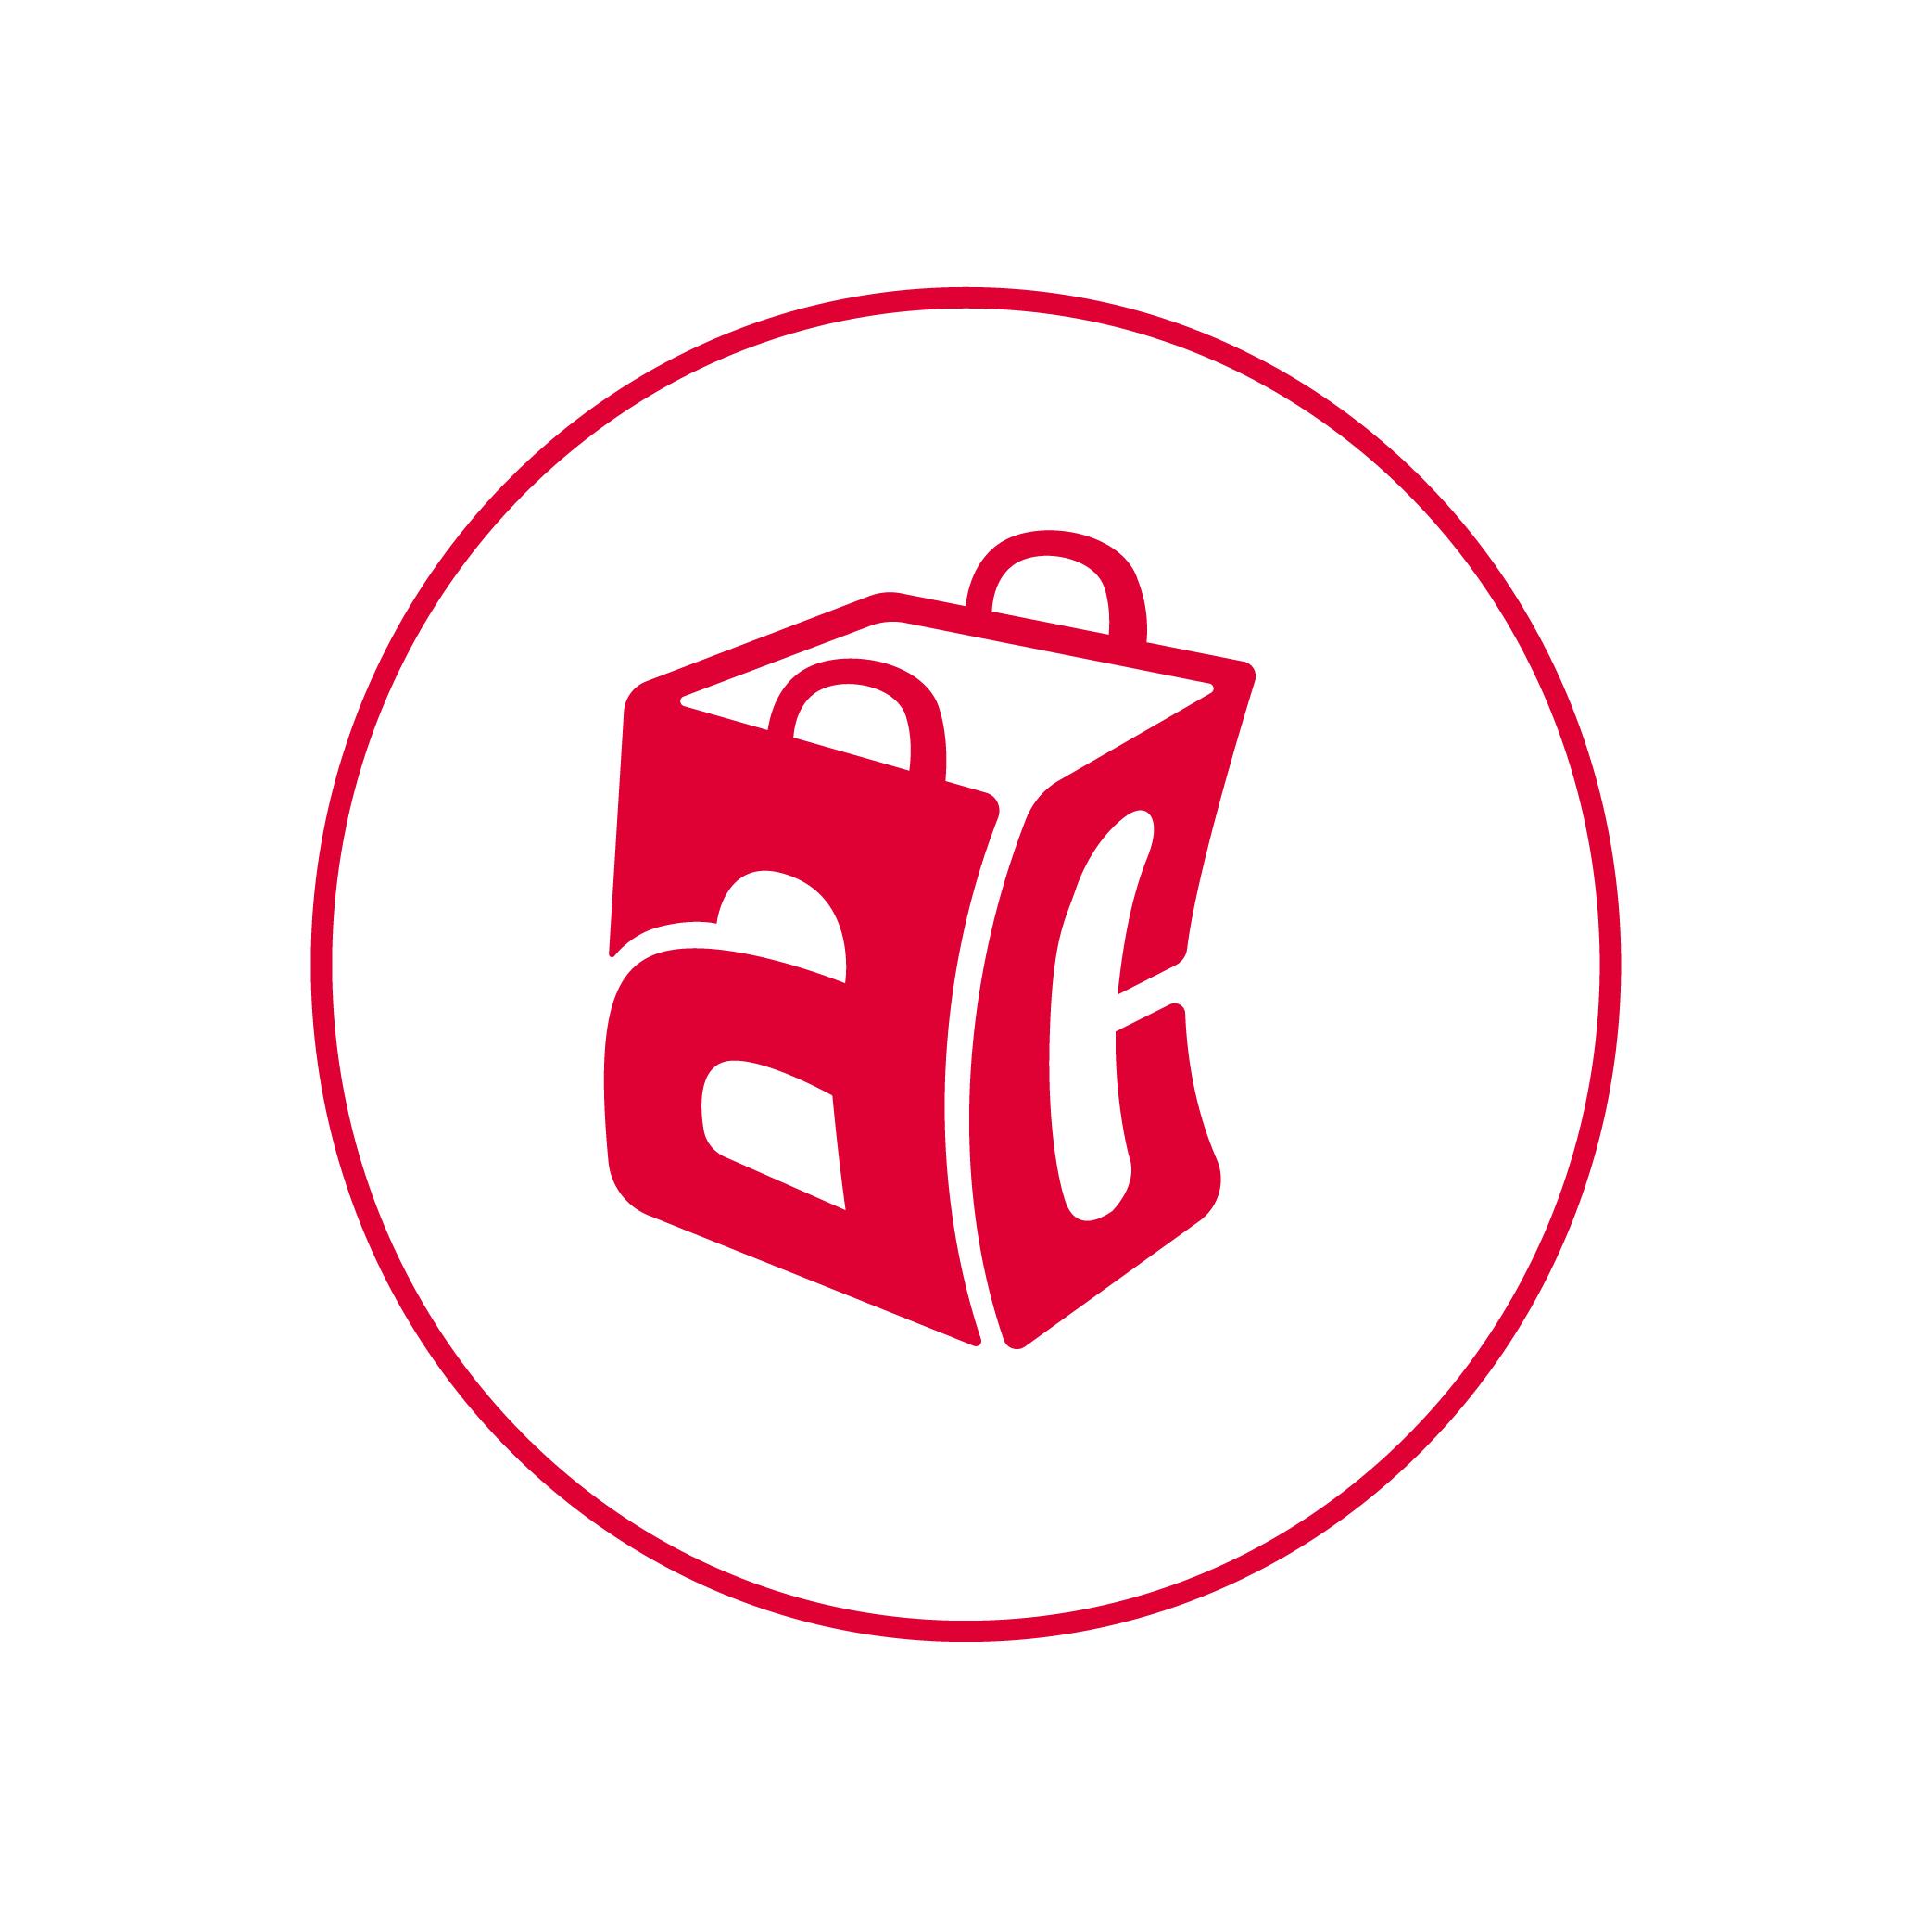 Arcacenter - Livro + Bolsa - Kit comunidade